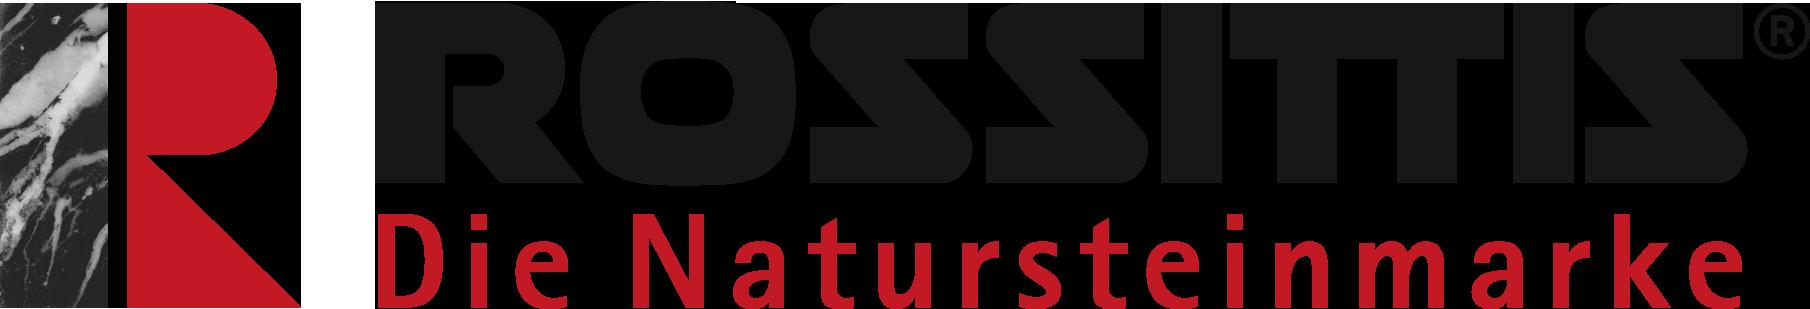 http://rossittis.de